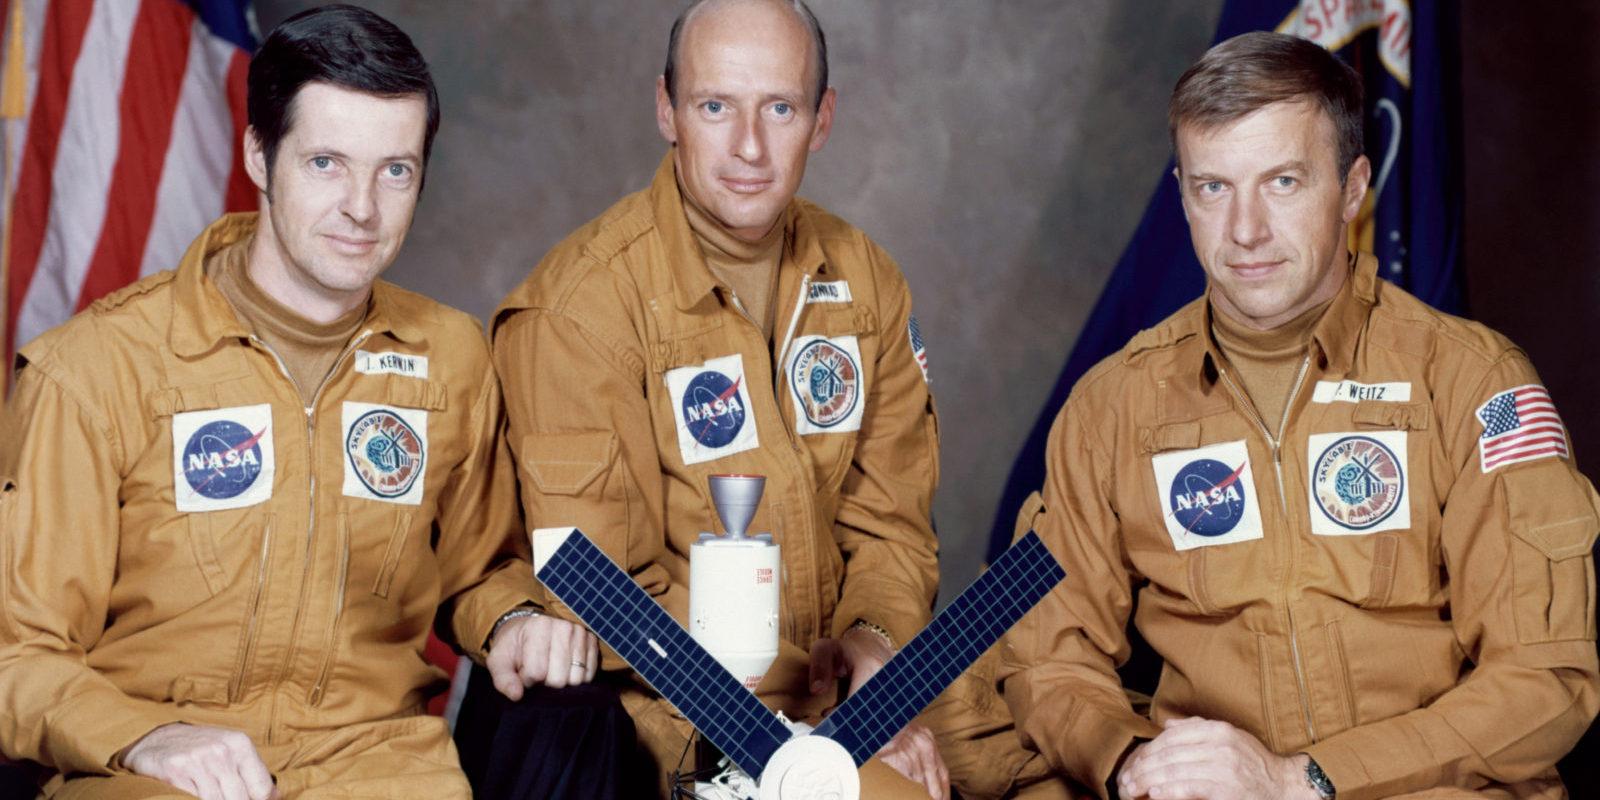 Skylab 2 Crew